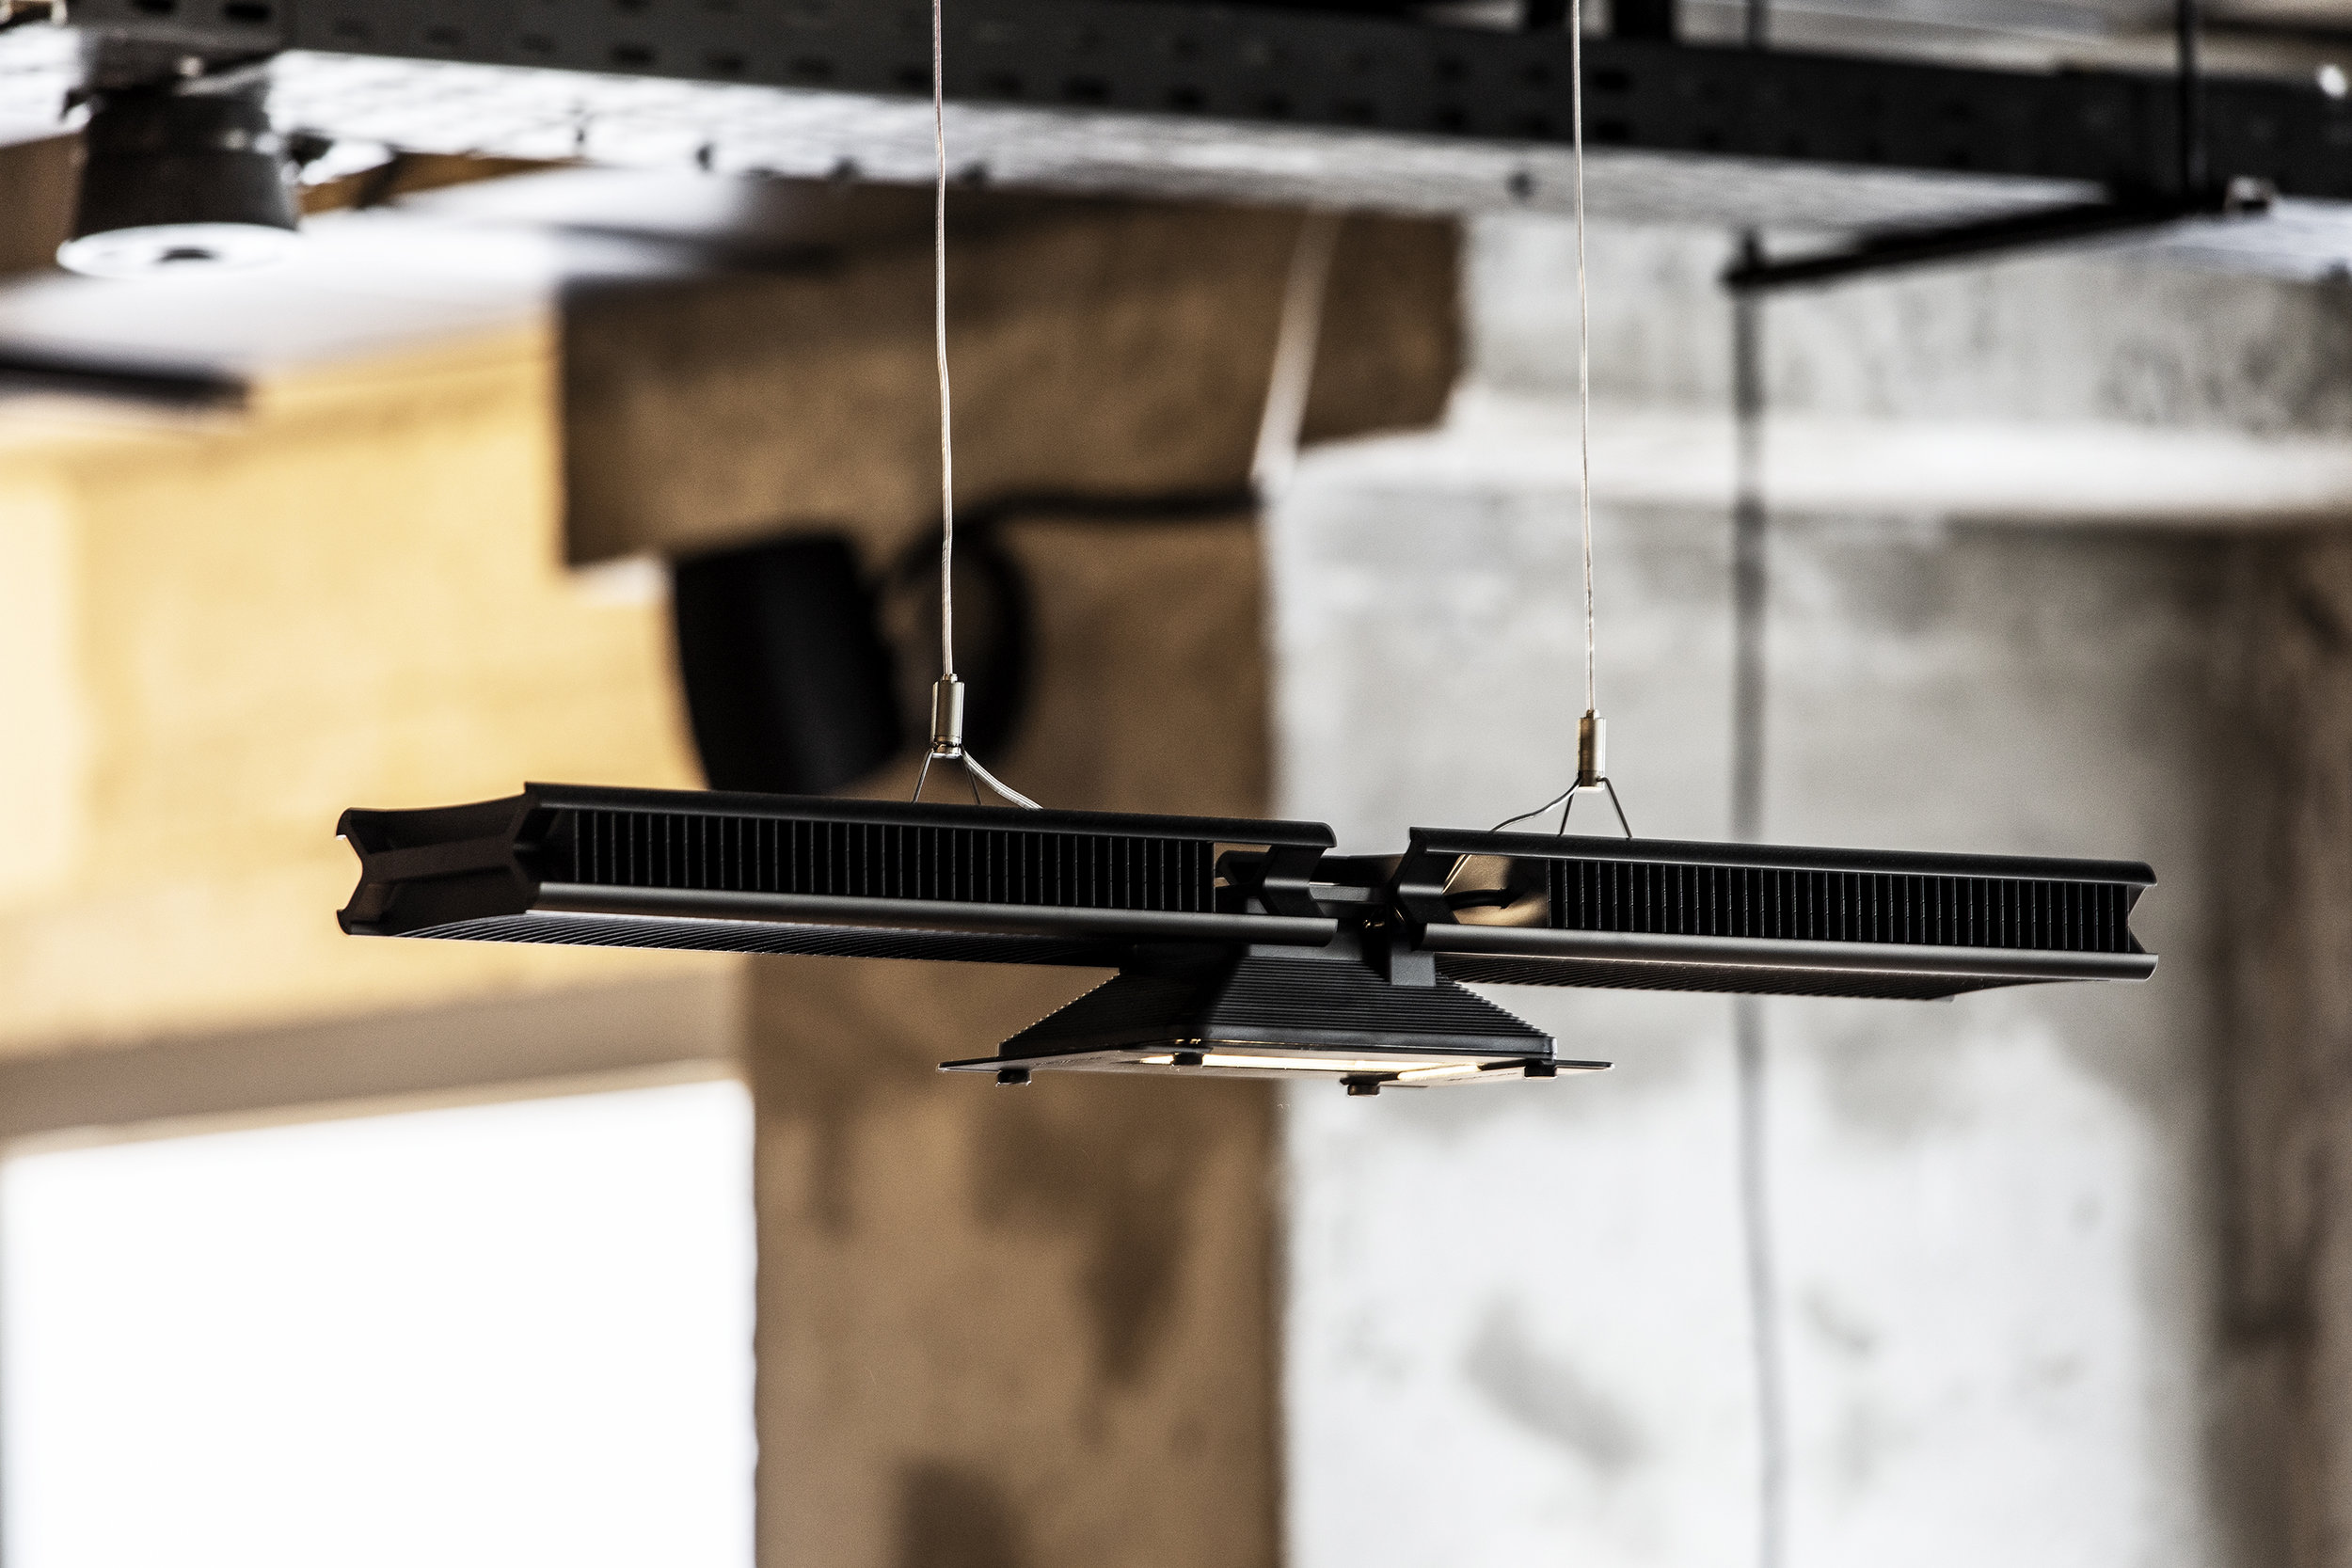 ROY DAVID ARCHITECTURE - STUDIO - ART MEDICAL OFFICES - רואי דוד אדריכלים - סטודיו רואי דוד - אדריכלות - ארט מדיקל (16).jpg